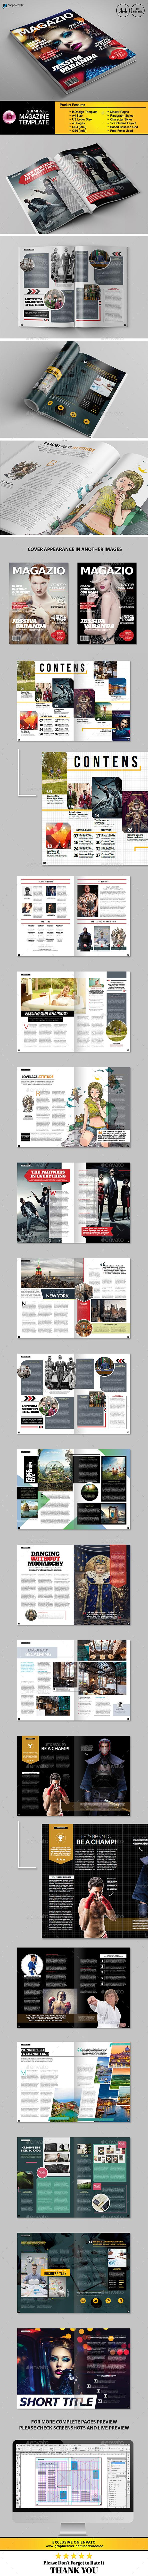 A4 Letter Magazine Template Vol.2 - Magazines Print Templates